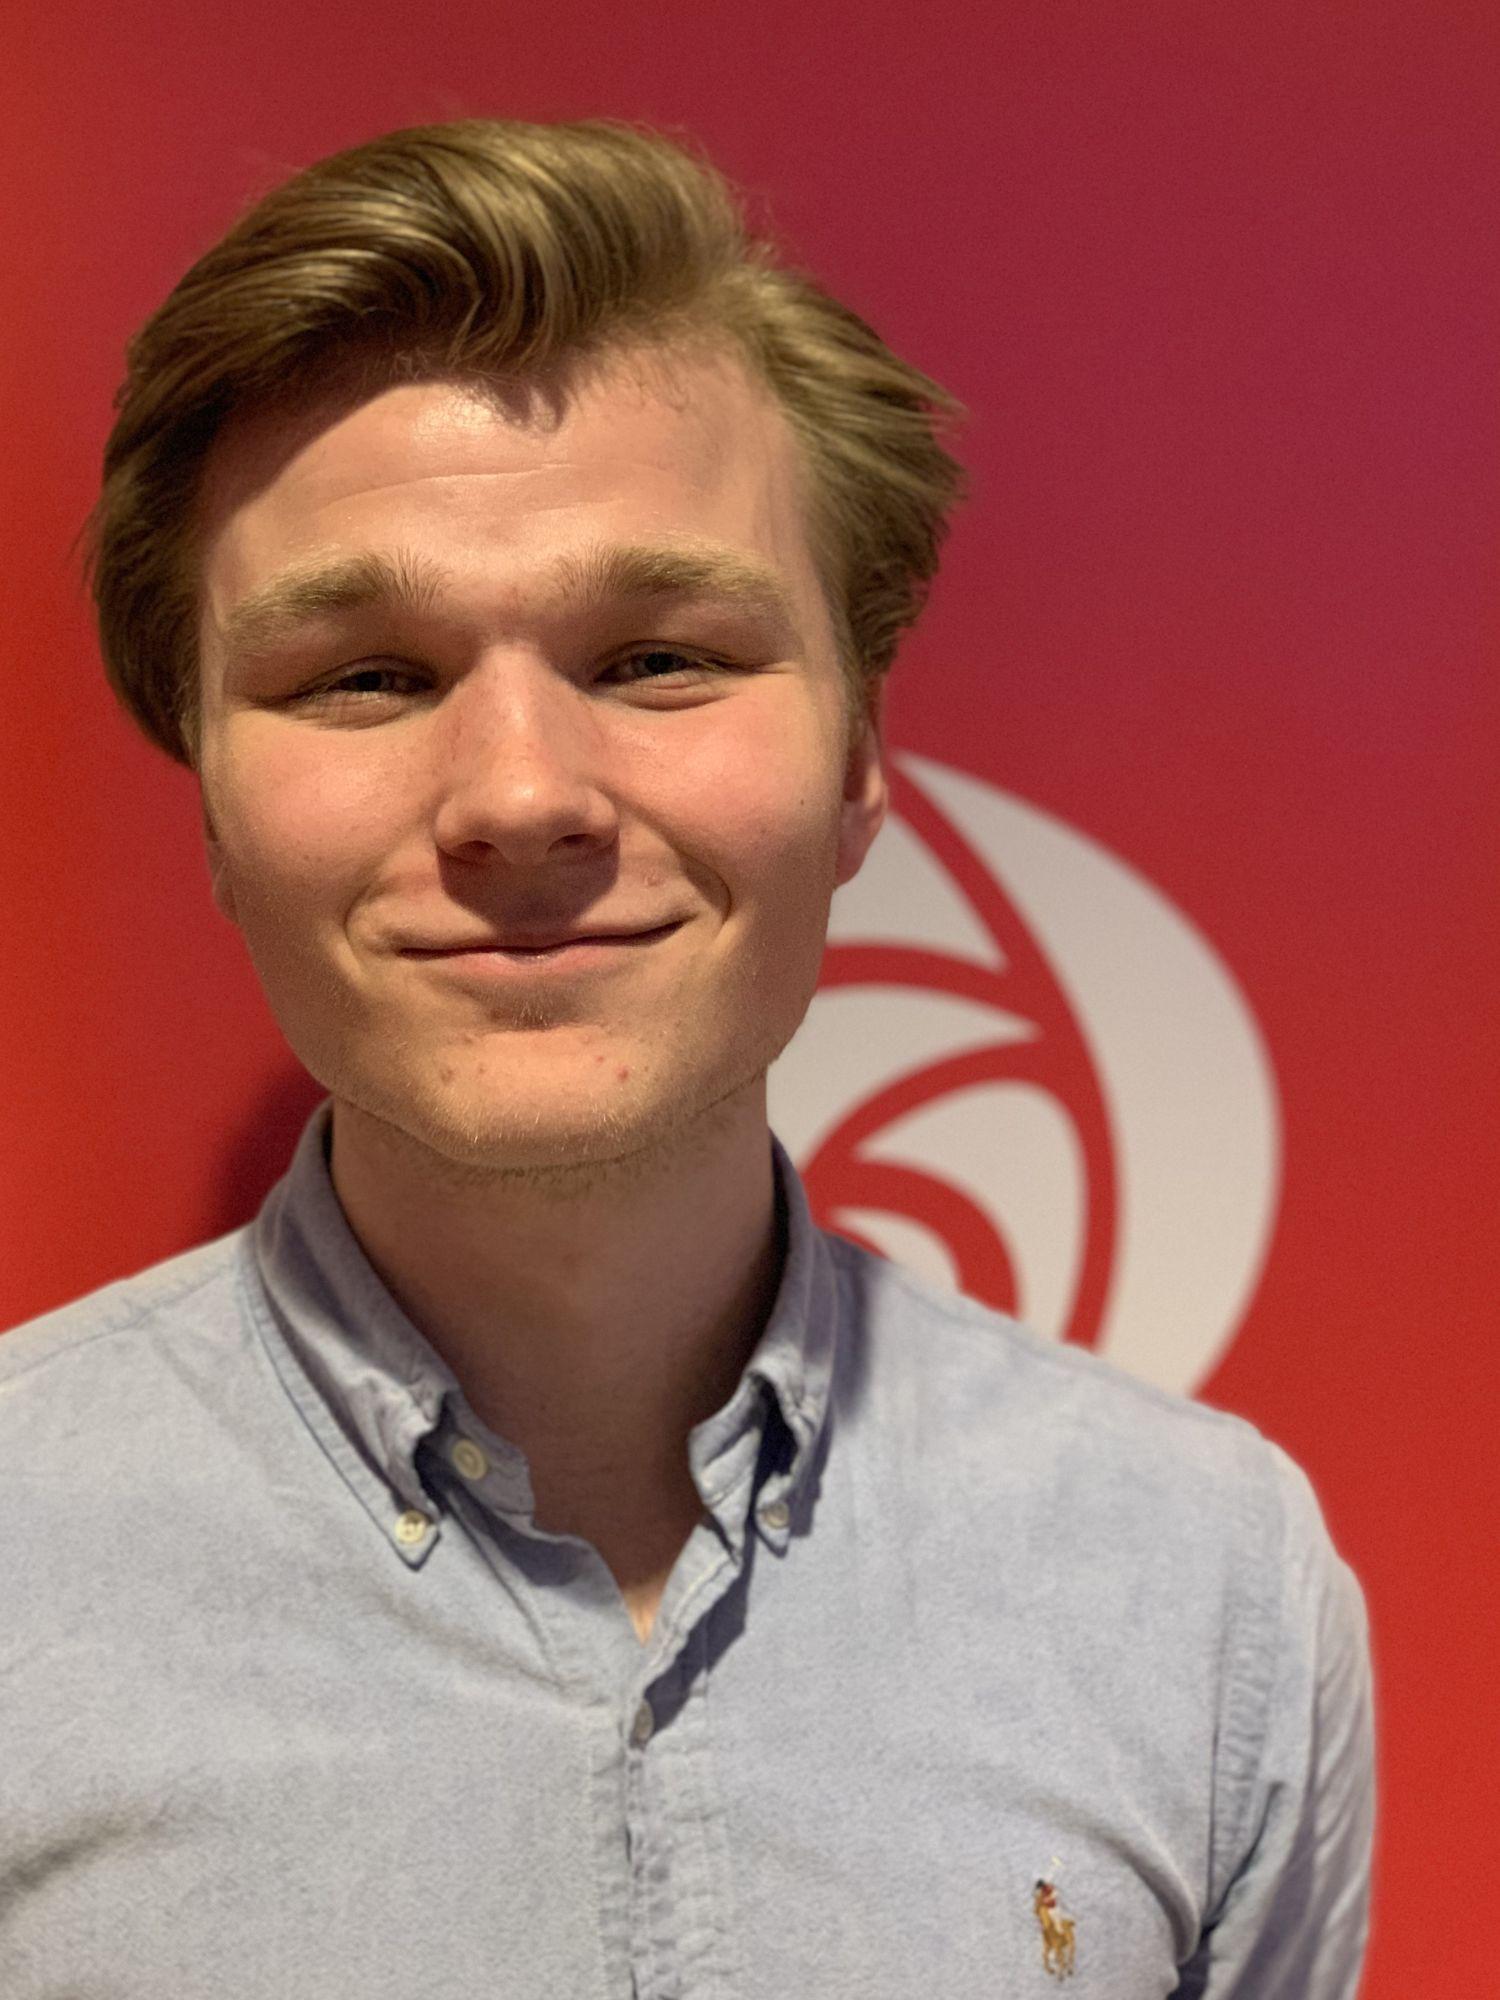 Nikolai Sti Ravlum, leder AUF i Telemark